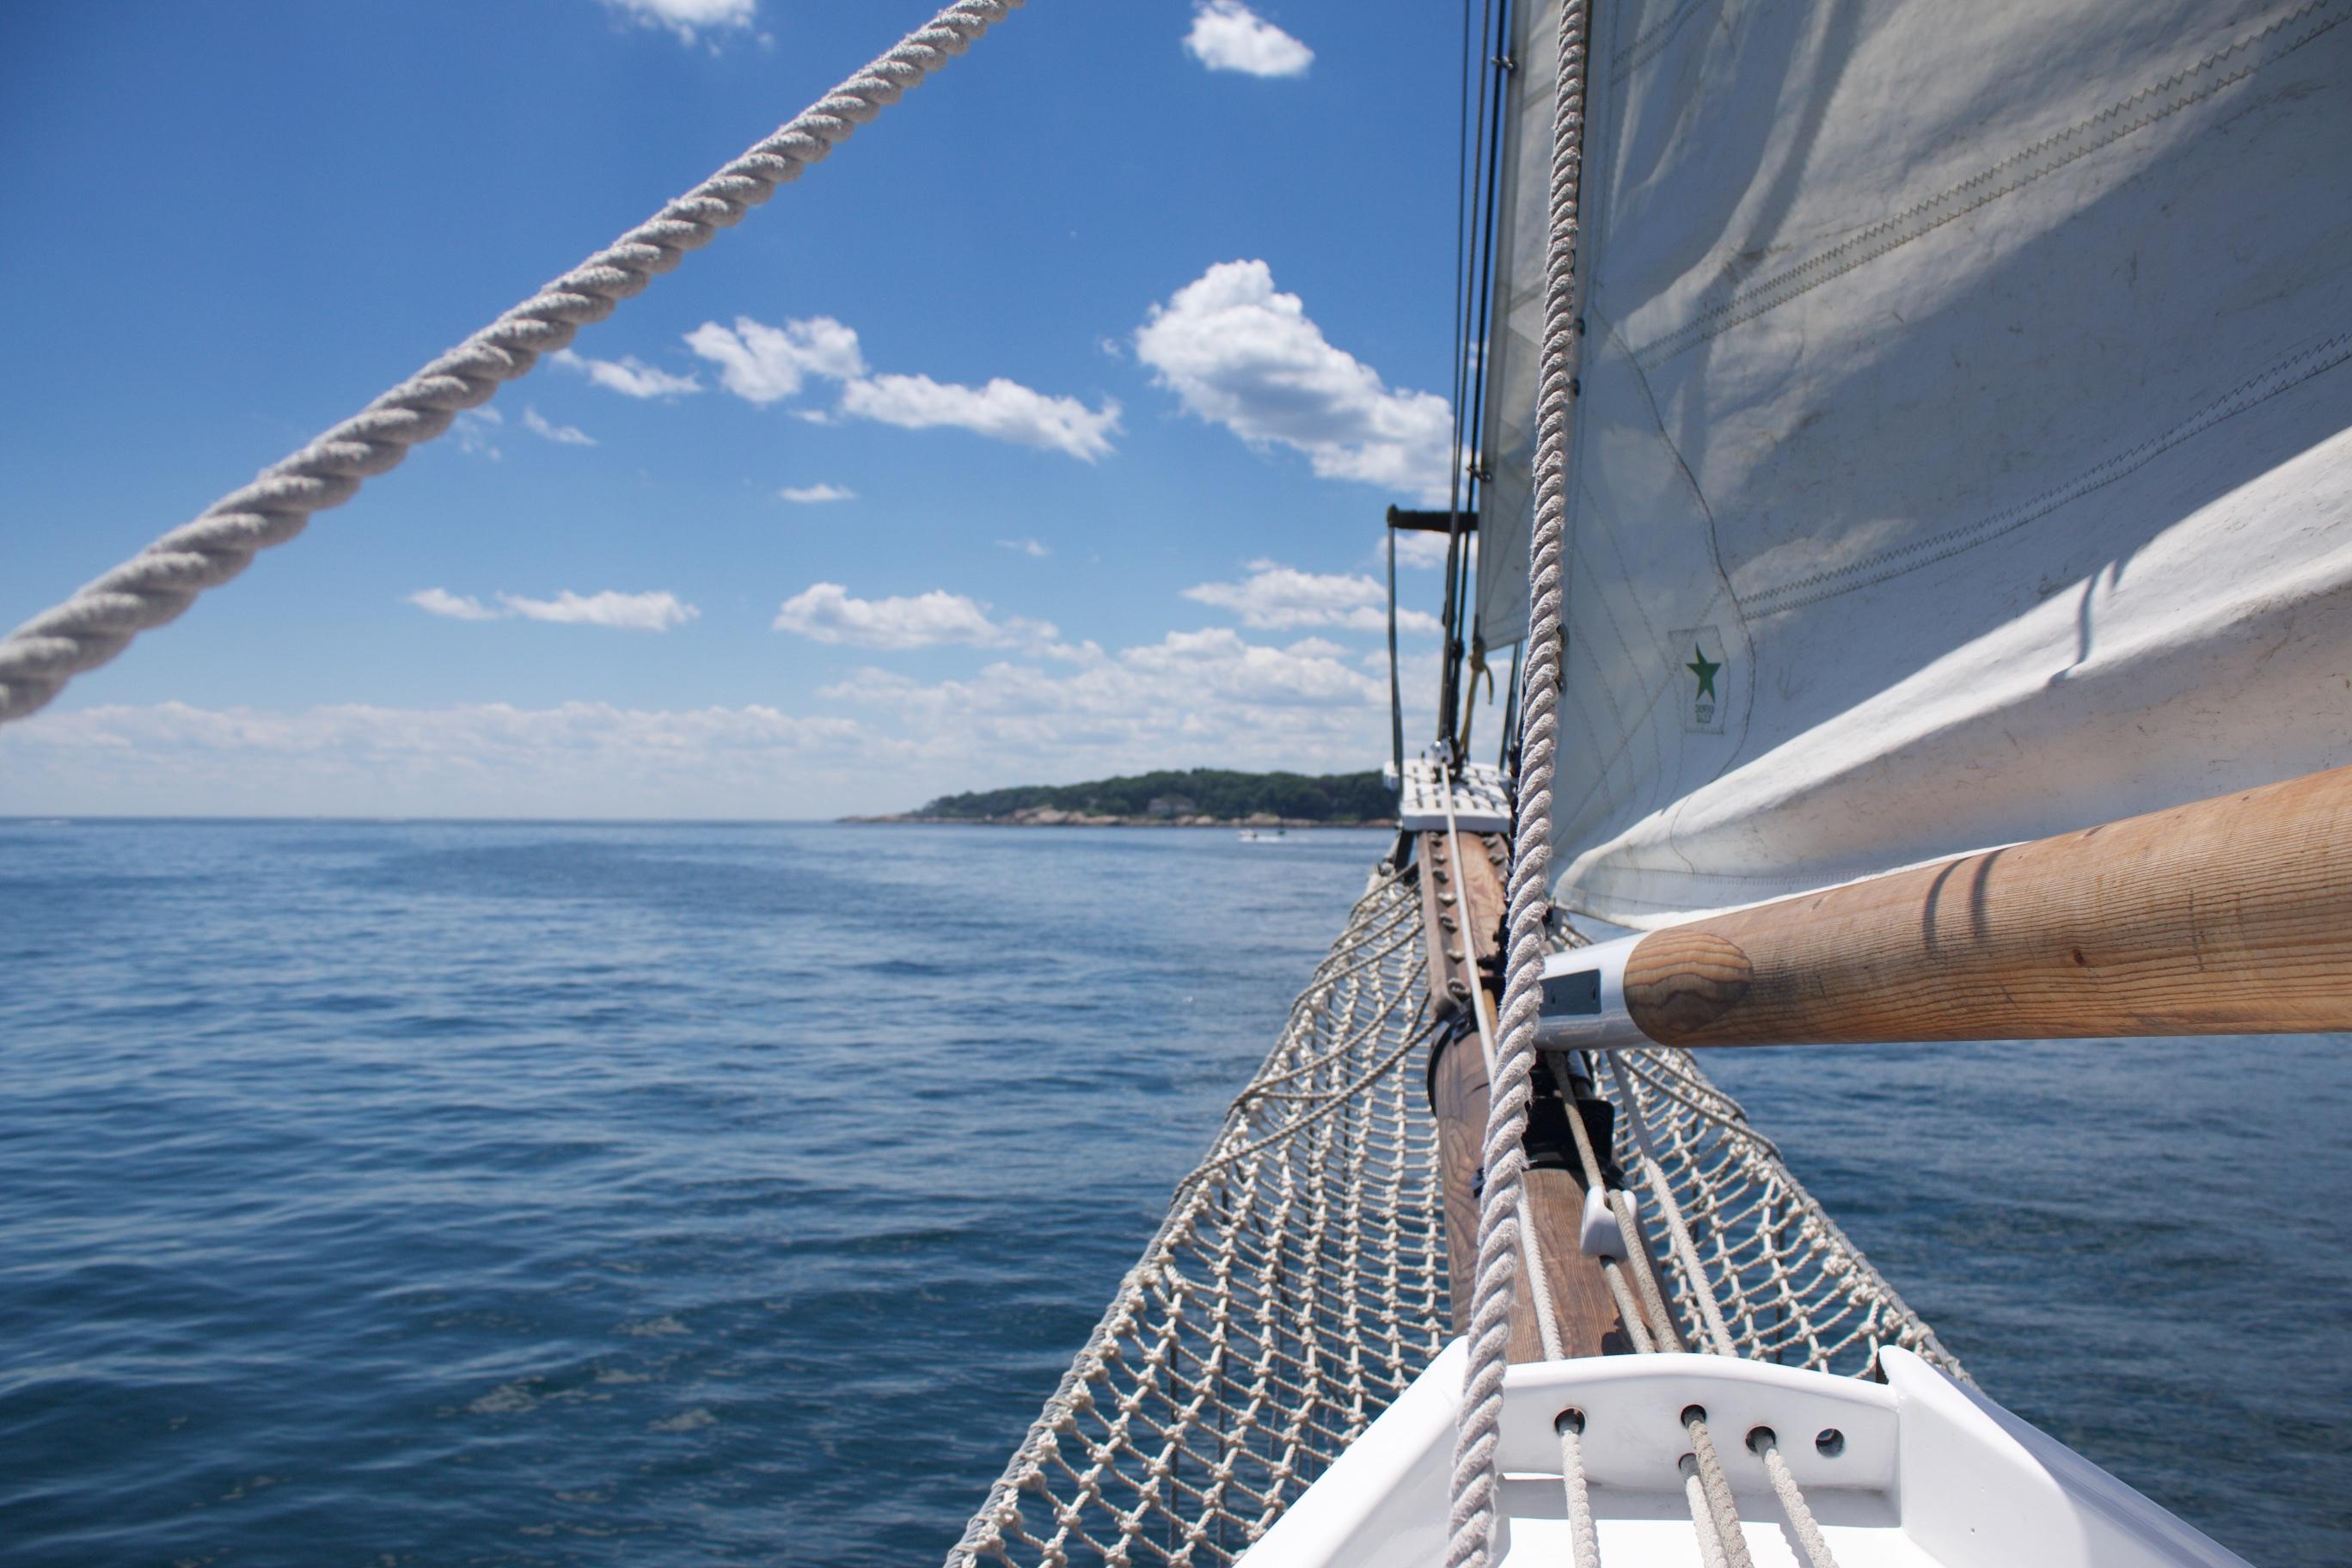 Bow of schooner at sea.